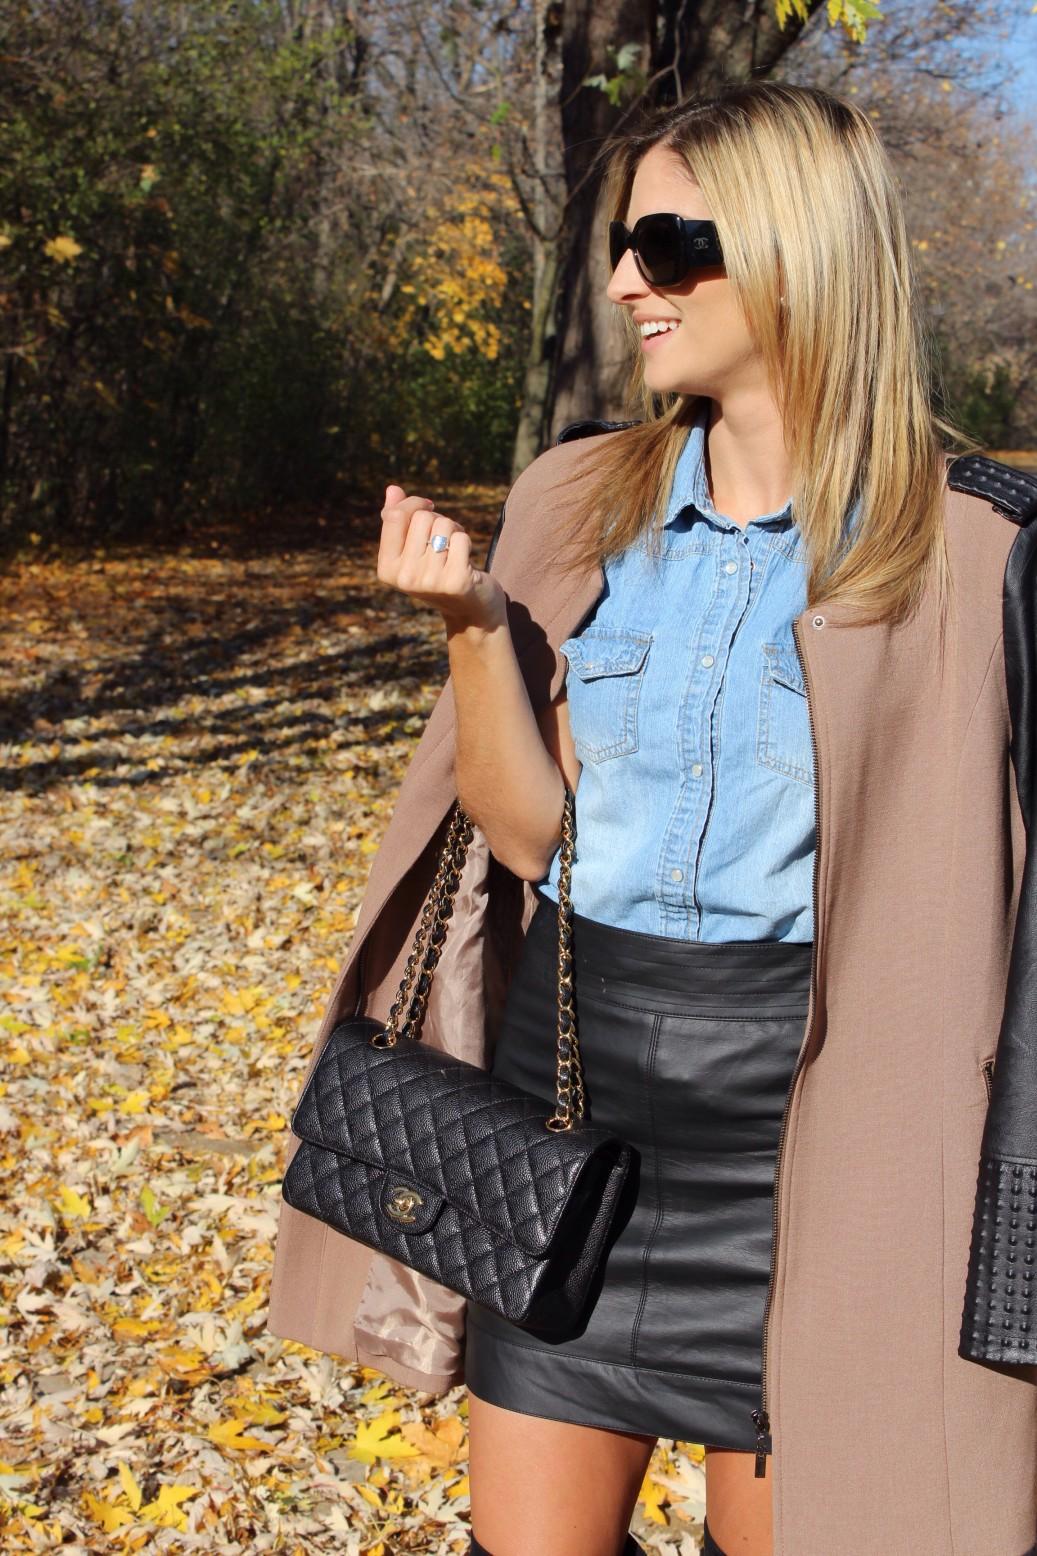 Chanel Classic Flap Bag sparkleshinylove